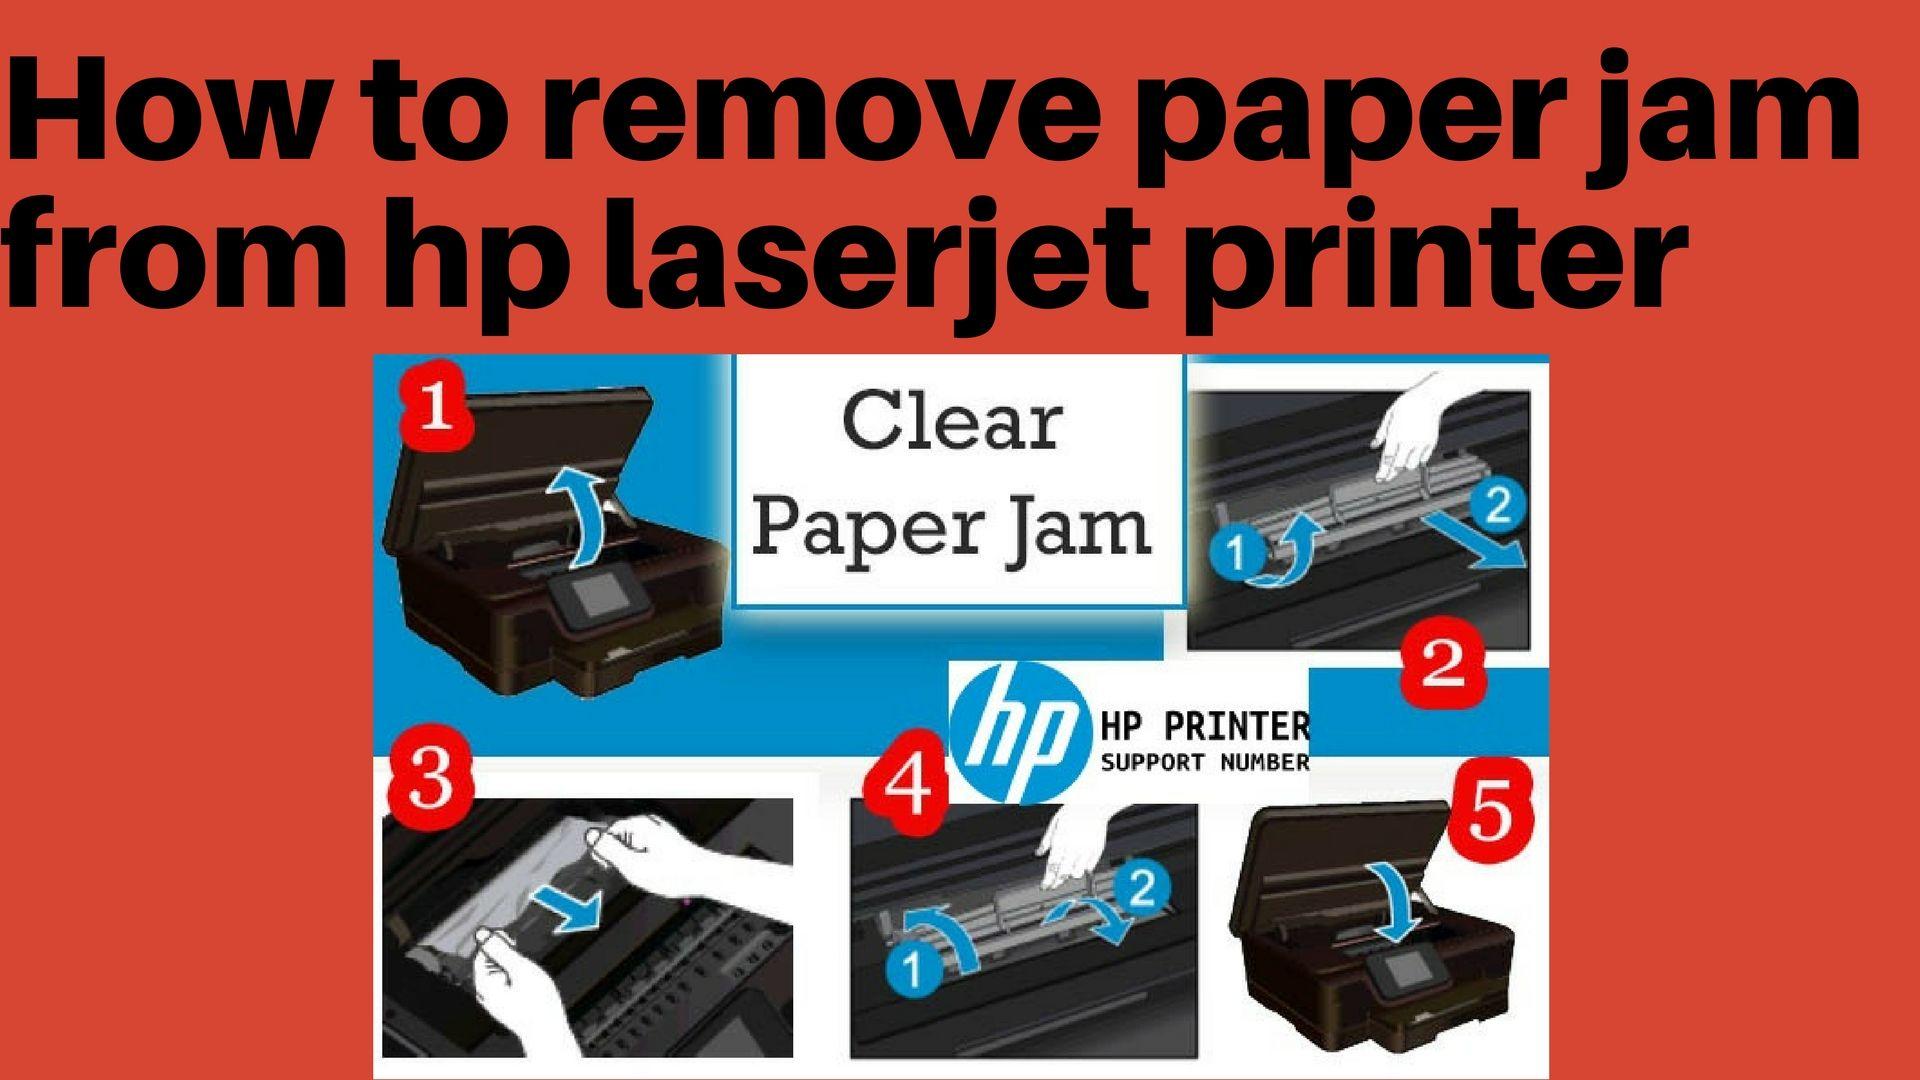 Pin by Printer Support on Hp printer | Hp printer, Printer paper